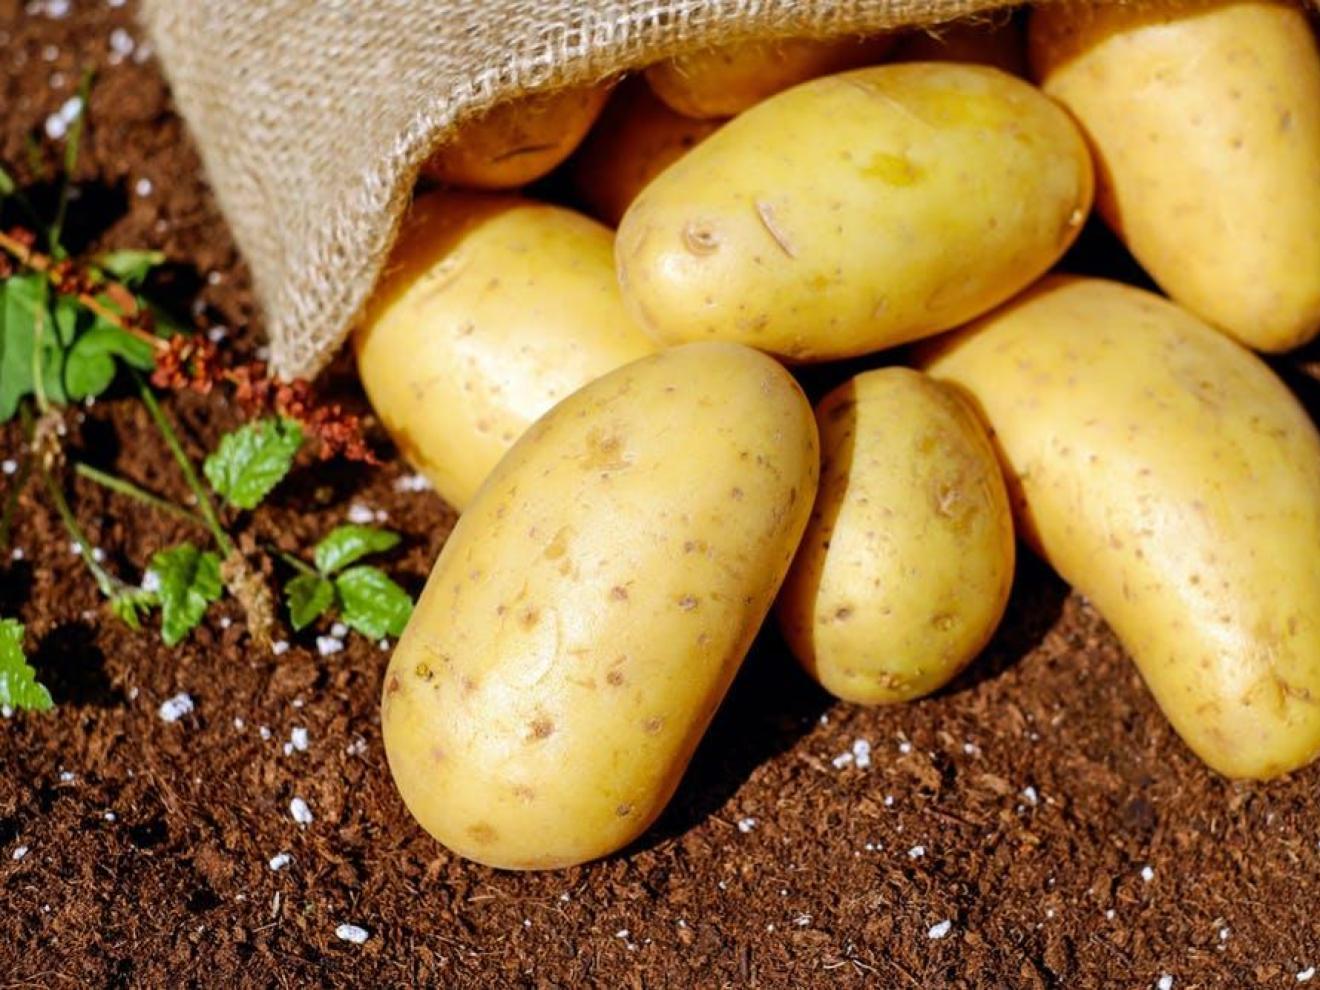 Colombian potatoes